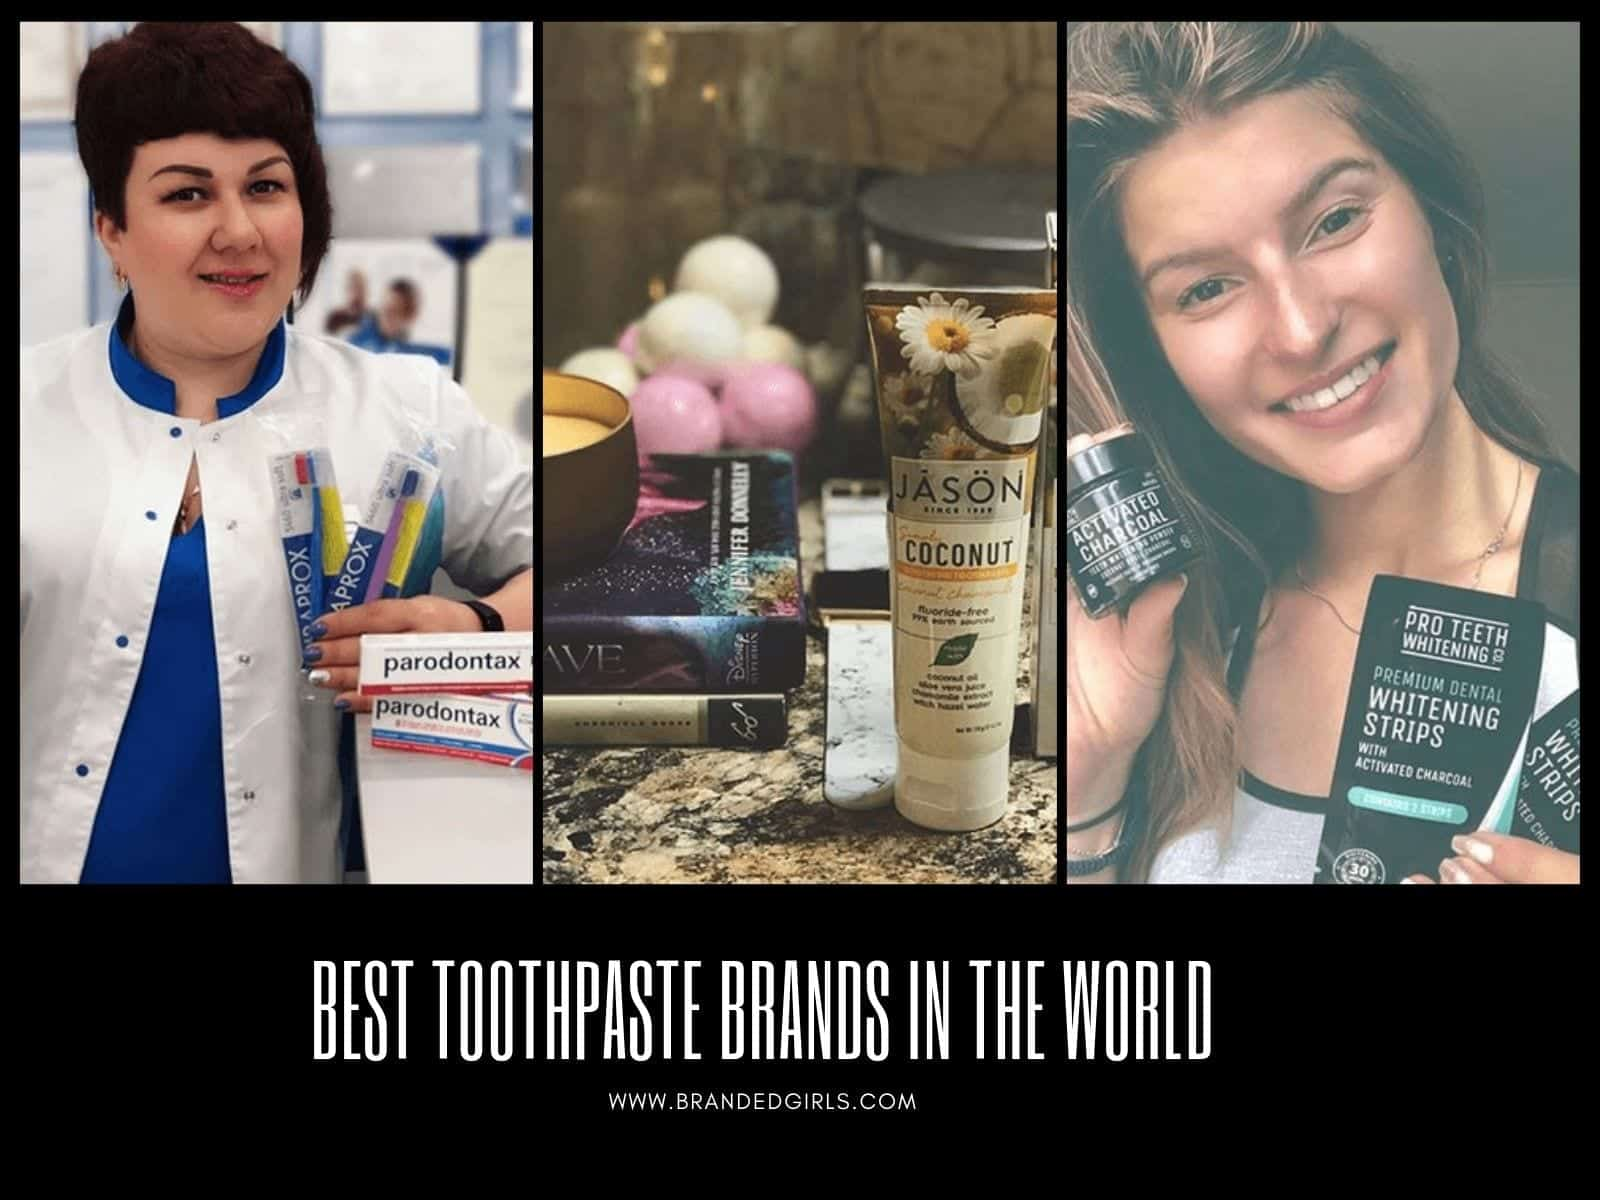 Best-Toothpaste-brands-in-the-world 16 Best Toothpaste Brands In The World To Buy In 2019